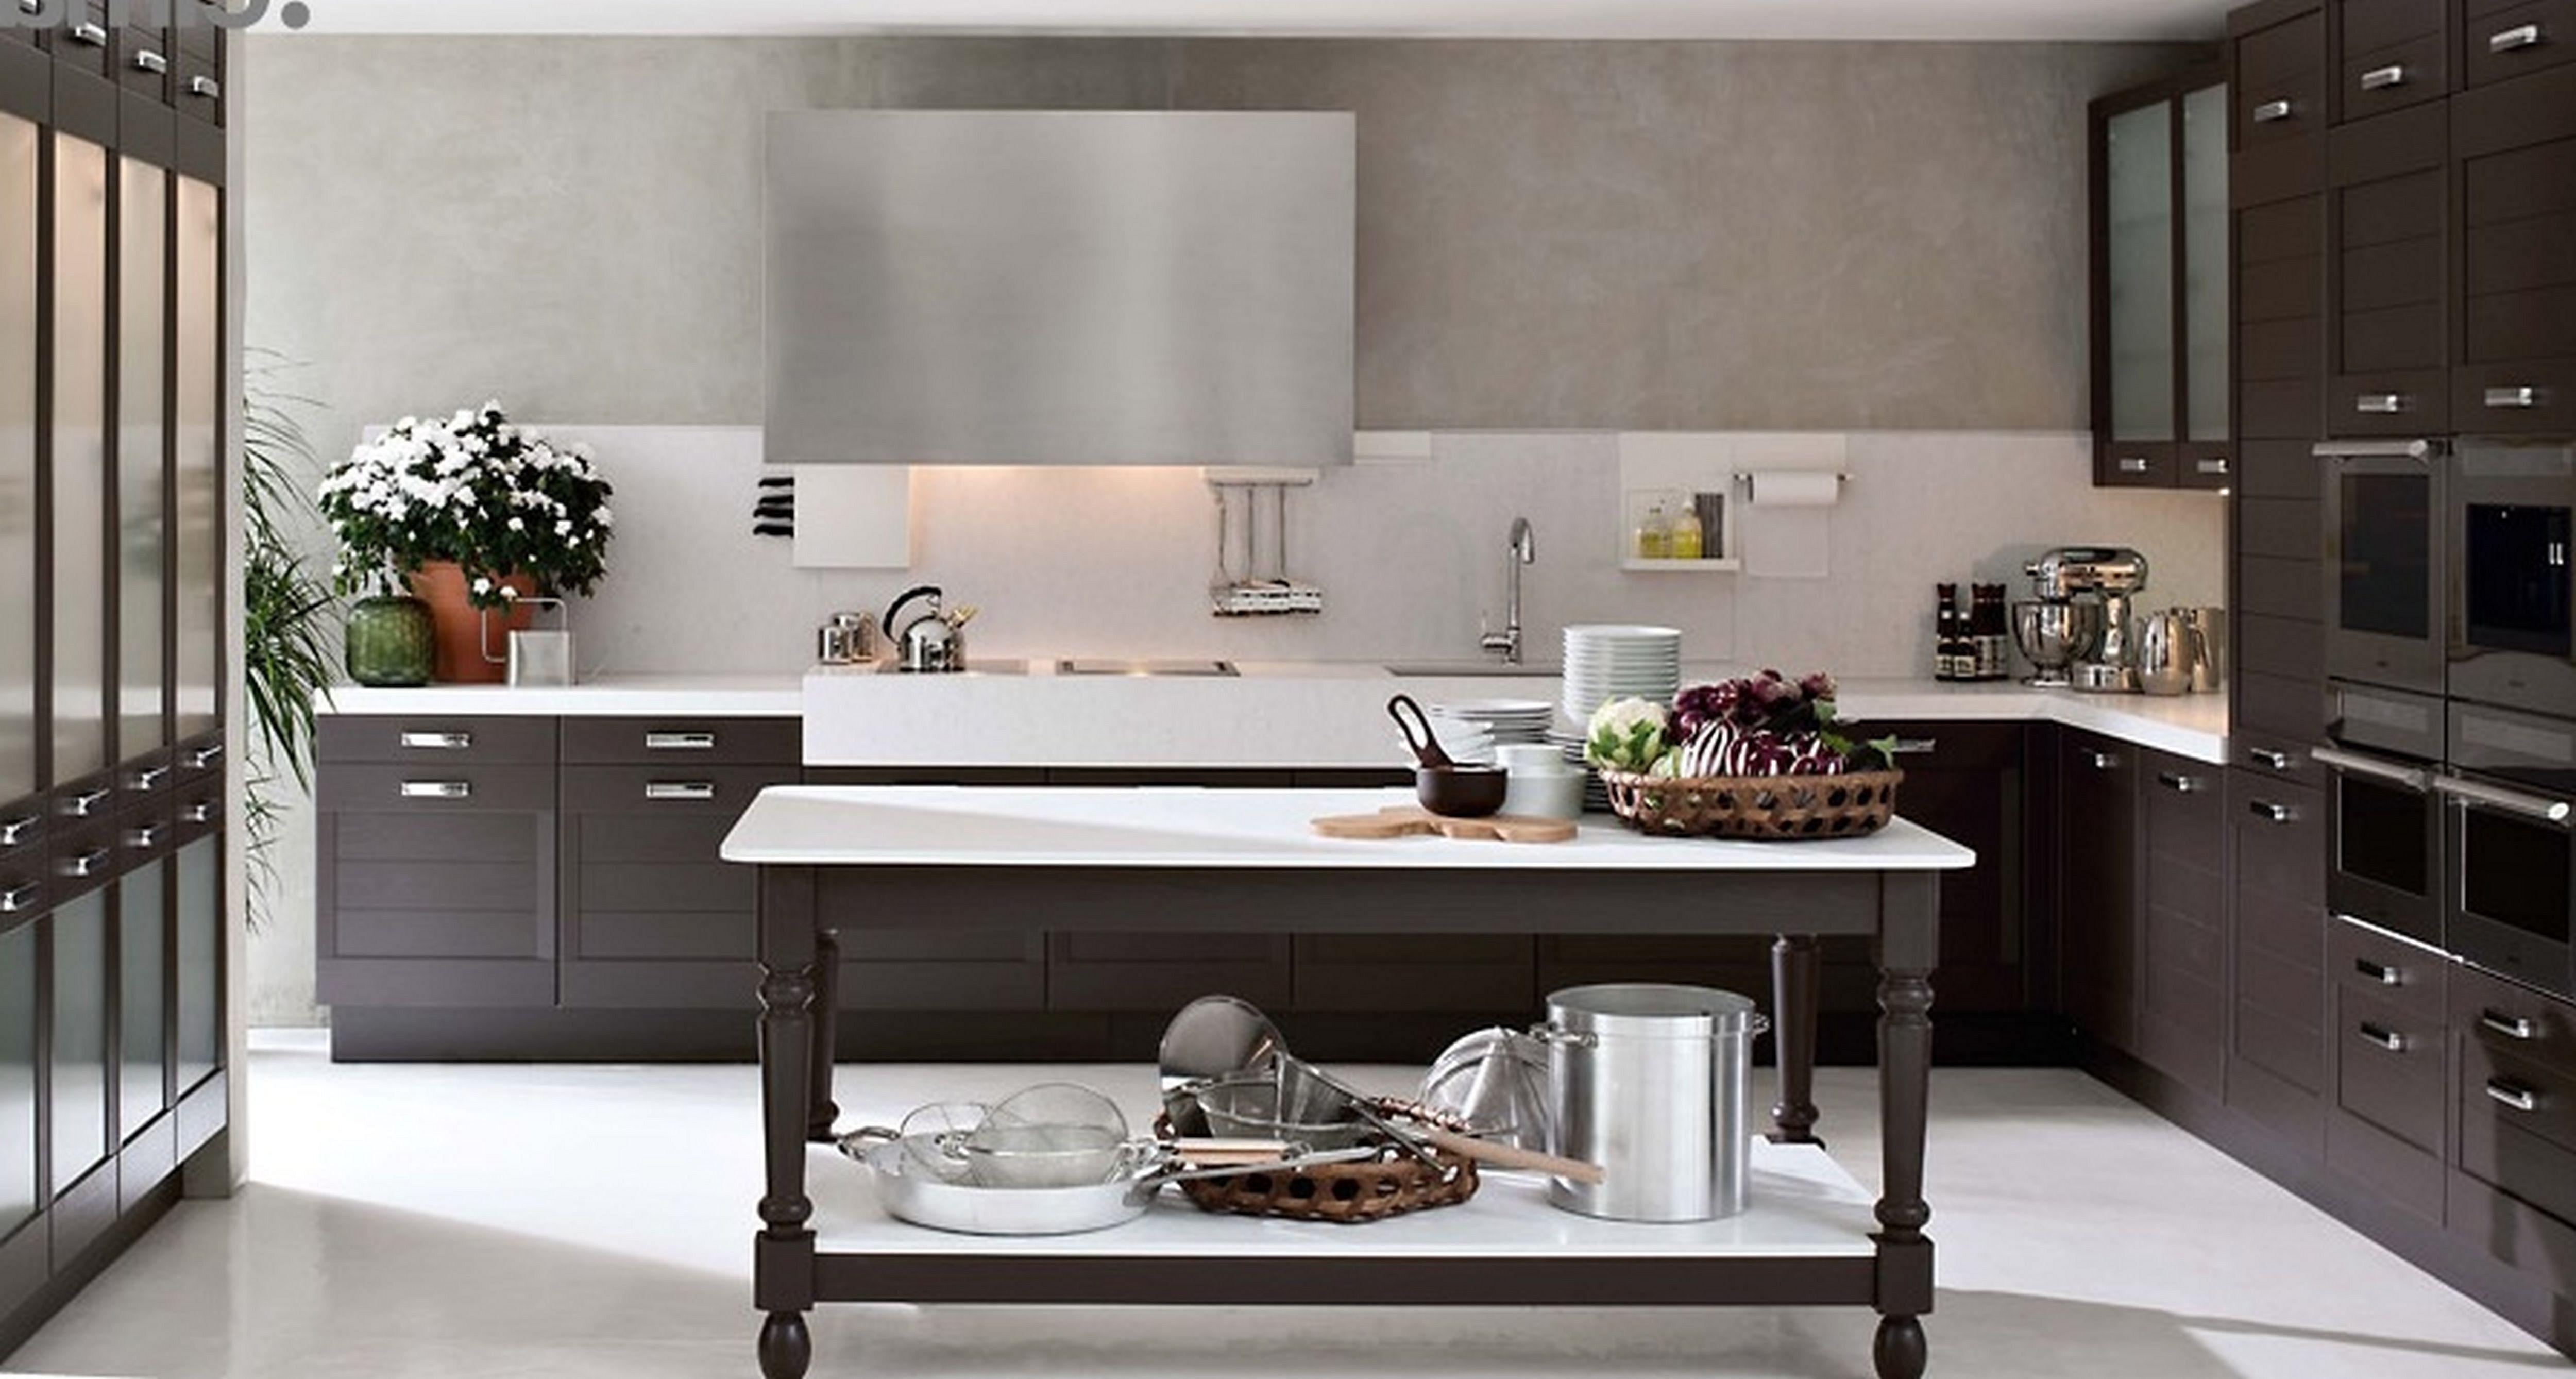 25 minimalist l shaped kitchen design for small kitchen ideas modern l shaped kitchens on l kitchen remodel id=22674